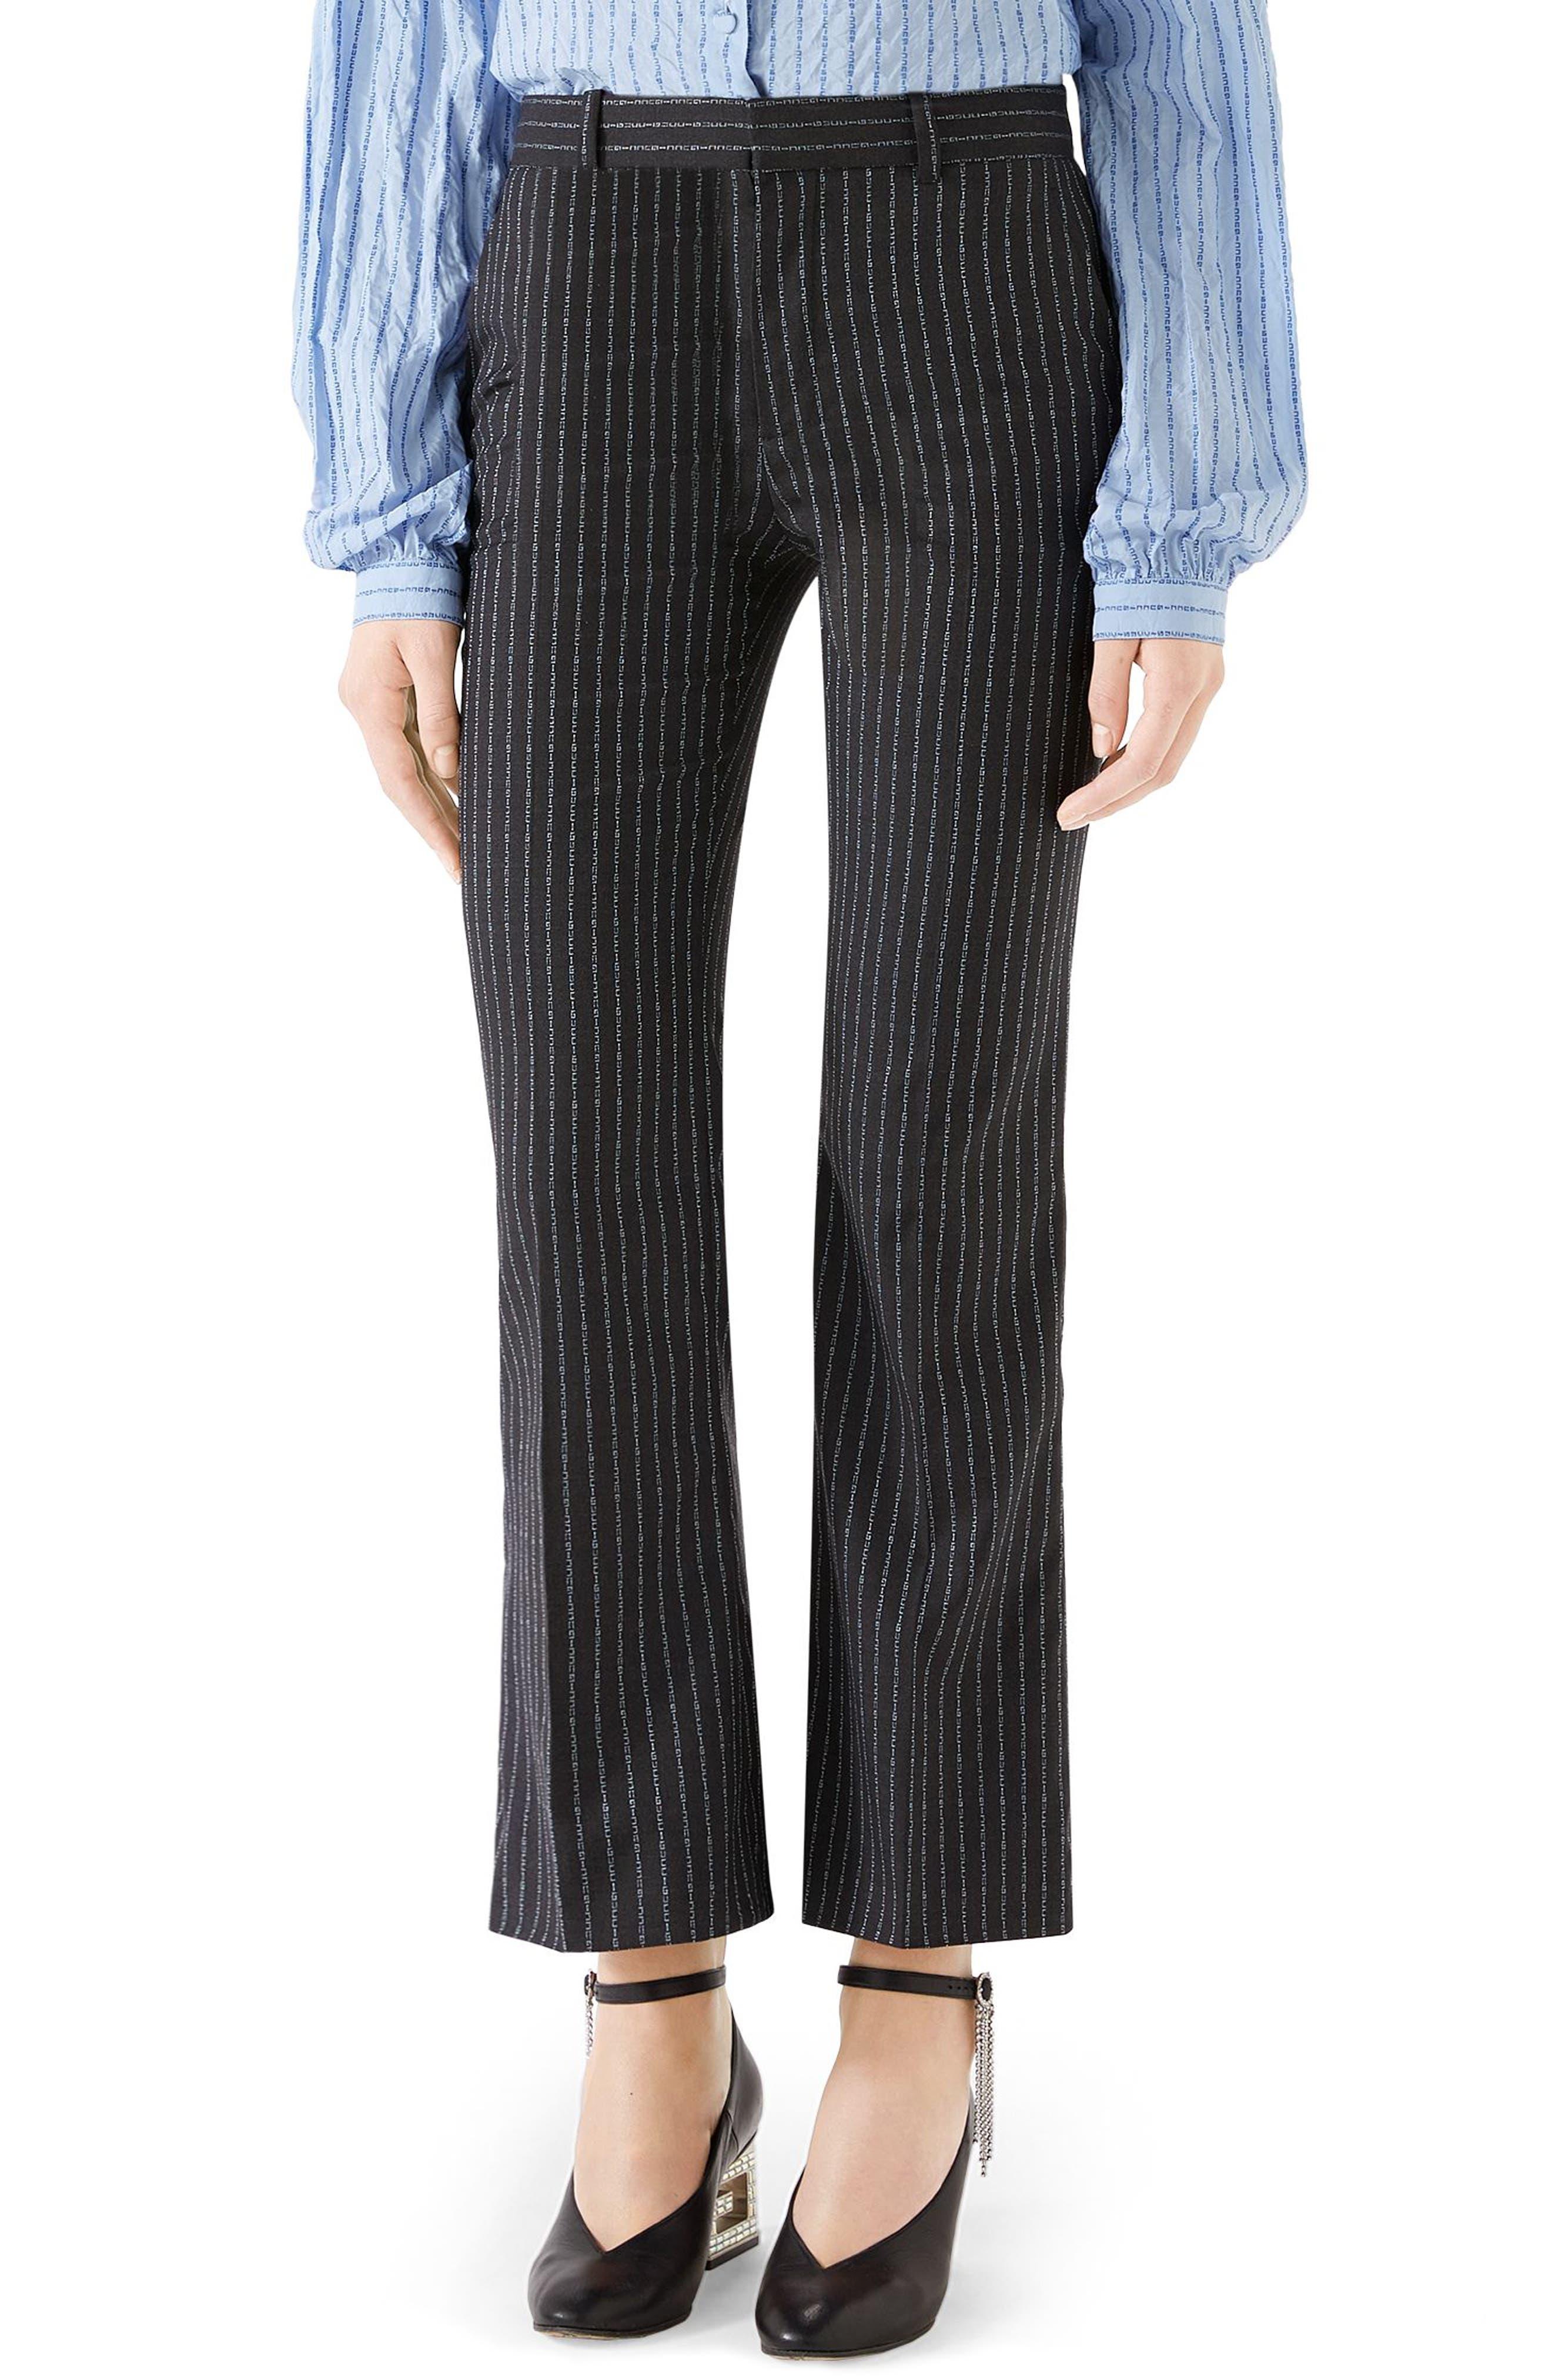 GUCCI,                             Gucci Stripe Bootcut Pants,                             Main thumbnail 1, color,                             1180 DARK GREY/ AZURE